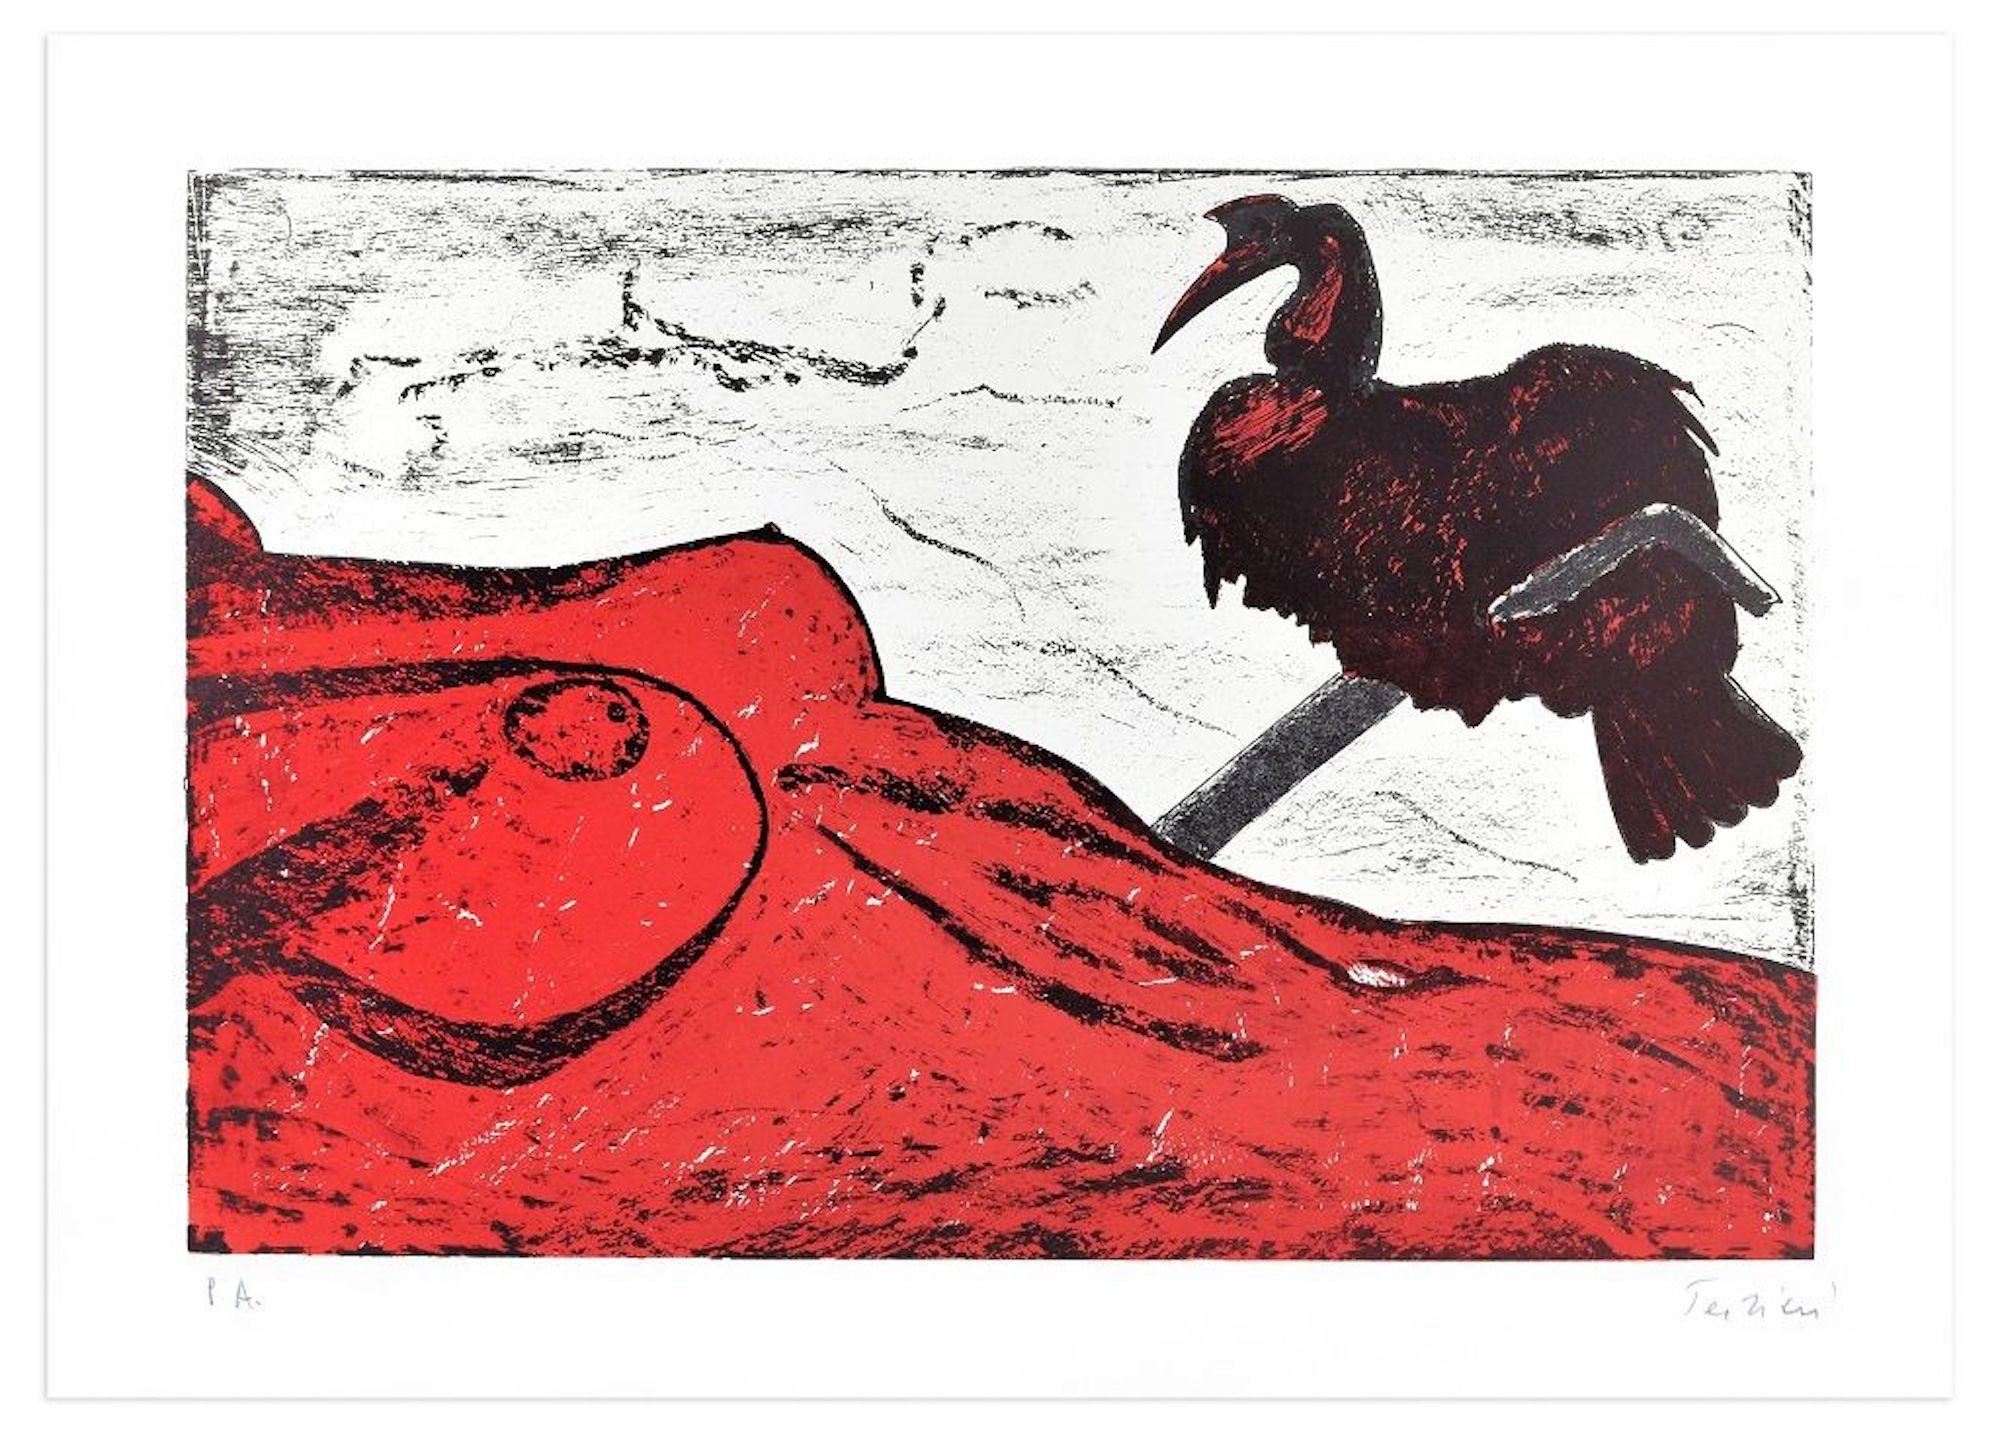 Pelican - Original Lithograph by Nino Terziari - 1970s